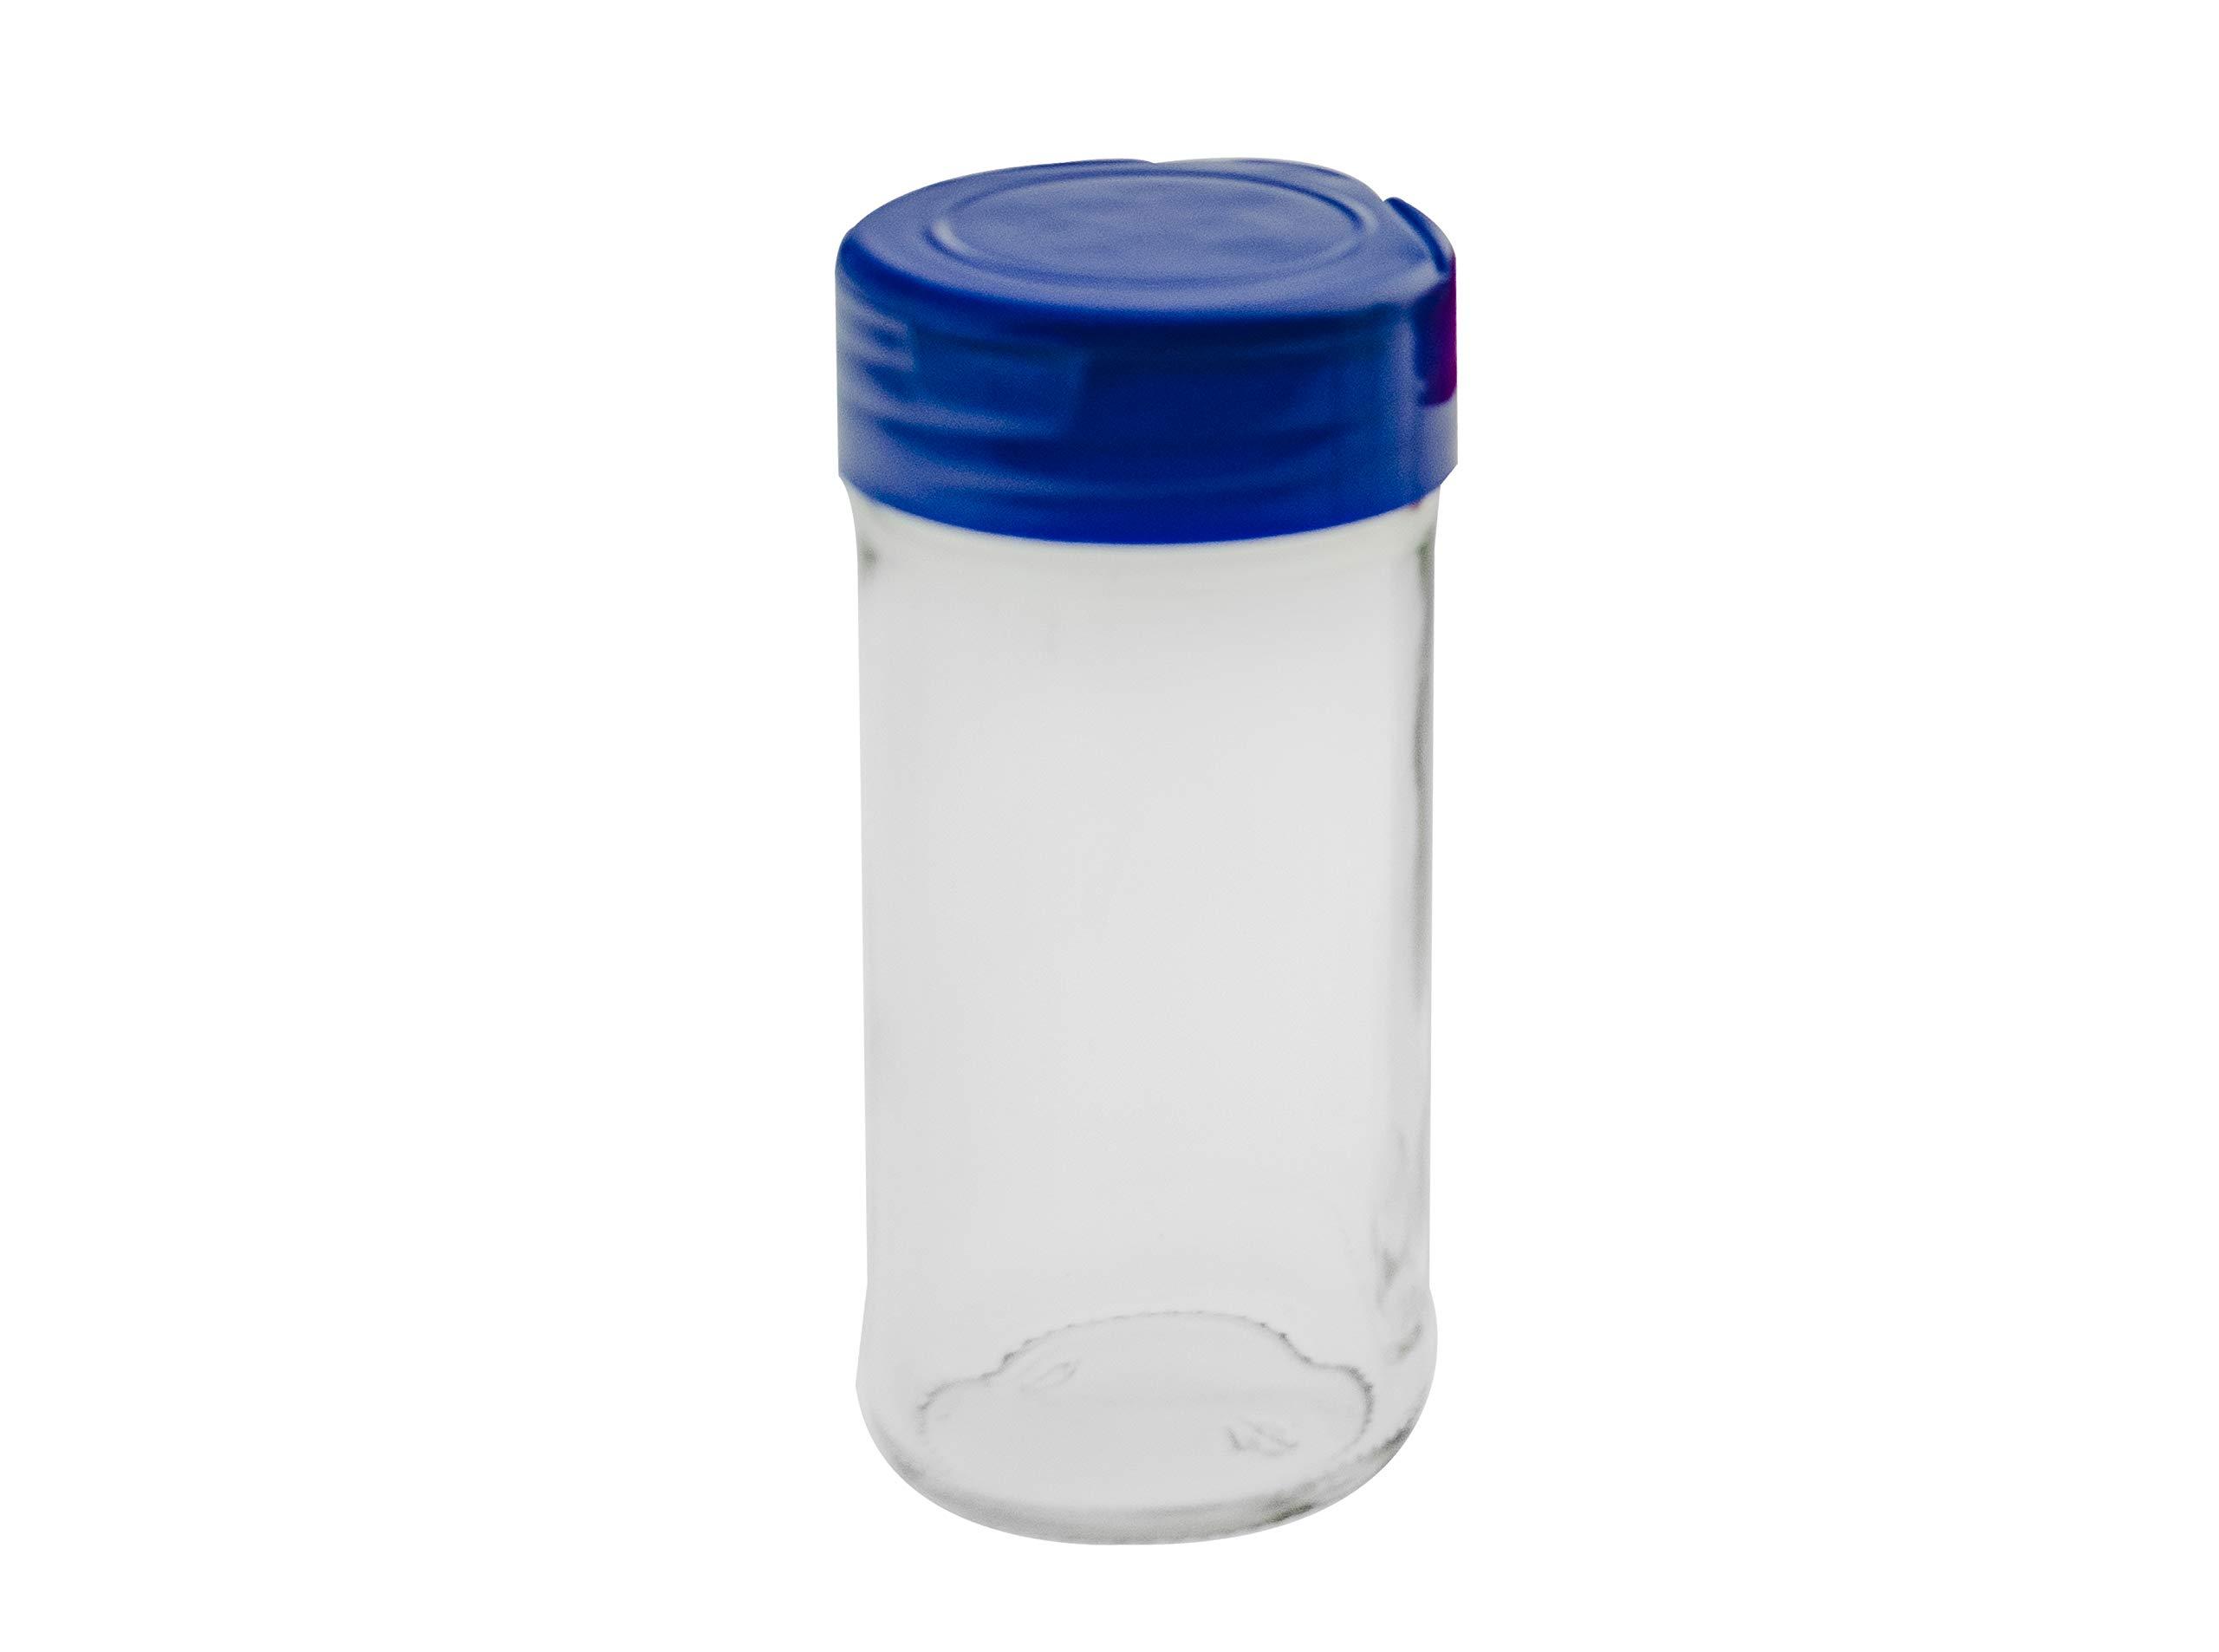 Marketing Holders Empty Bottle for Spice Seasoning Storage Cylinder Salt Shaker Dry Herb Container Jar 4 oz Blue Lid Qty 2